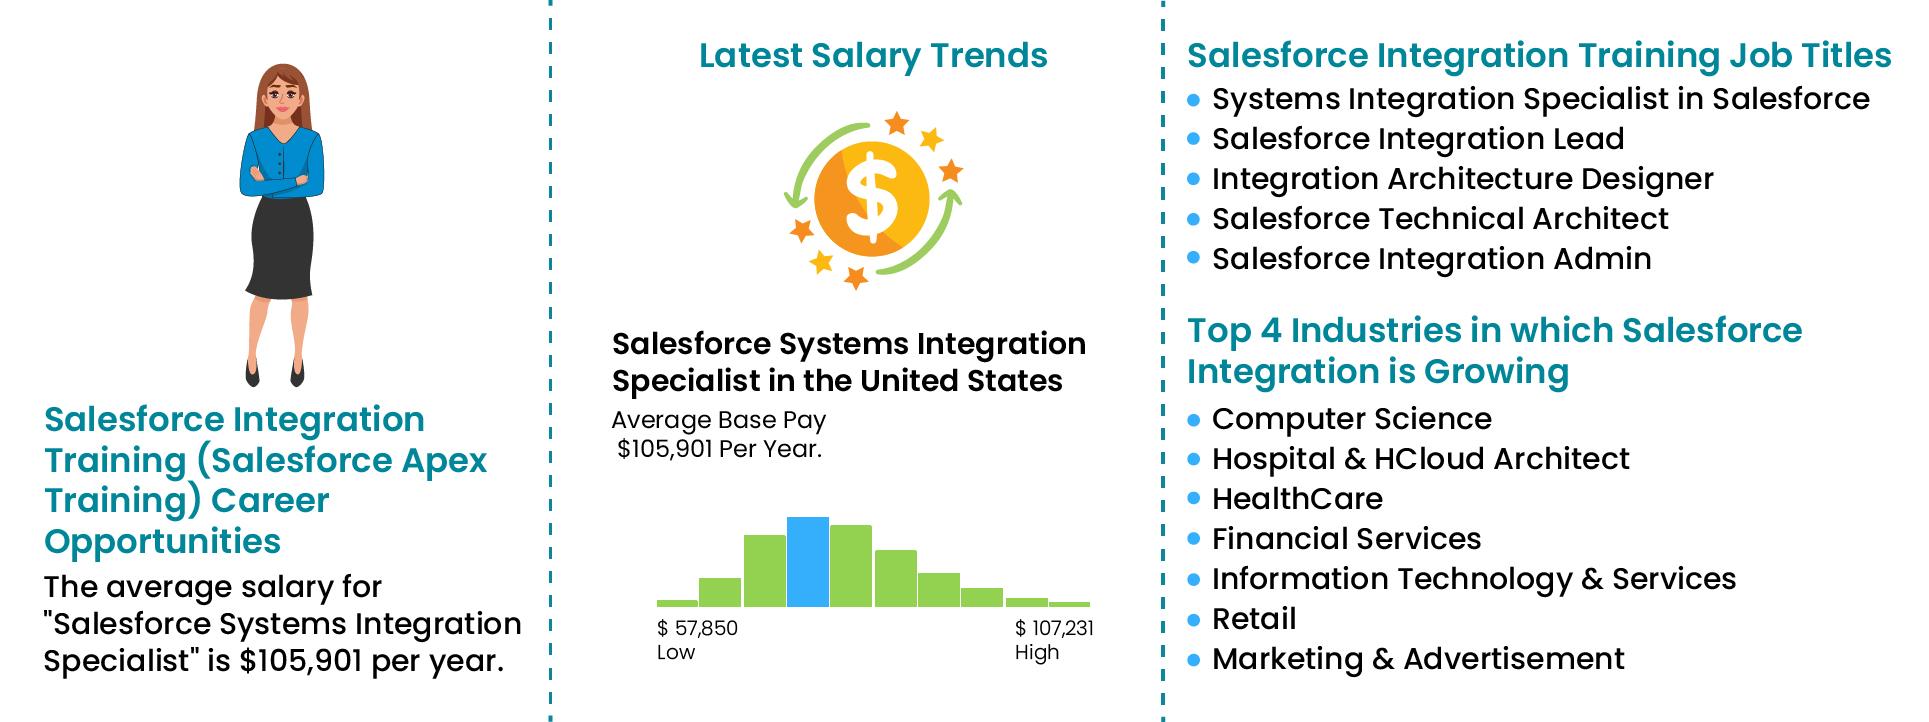 Salesforce Apex Training-Joboutlook|ZaranTech